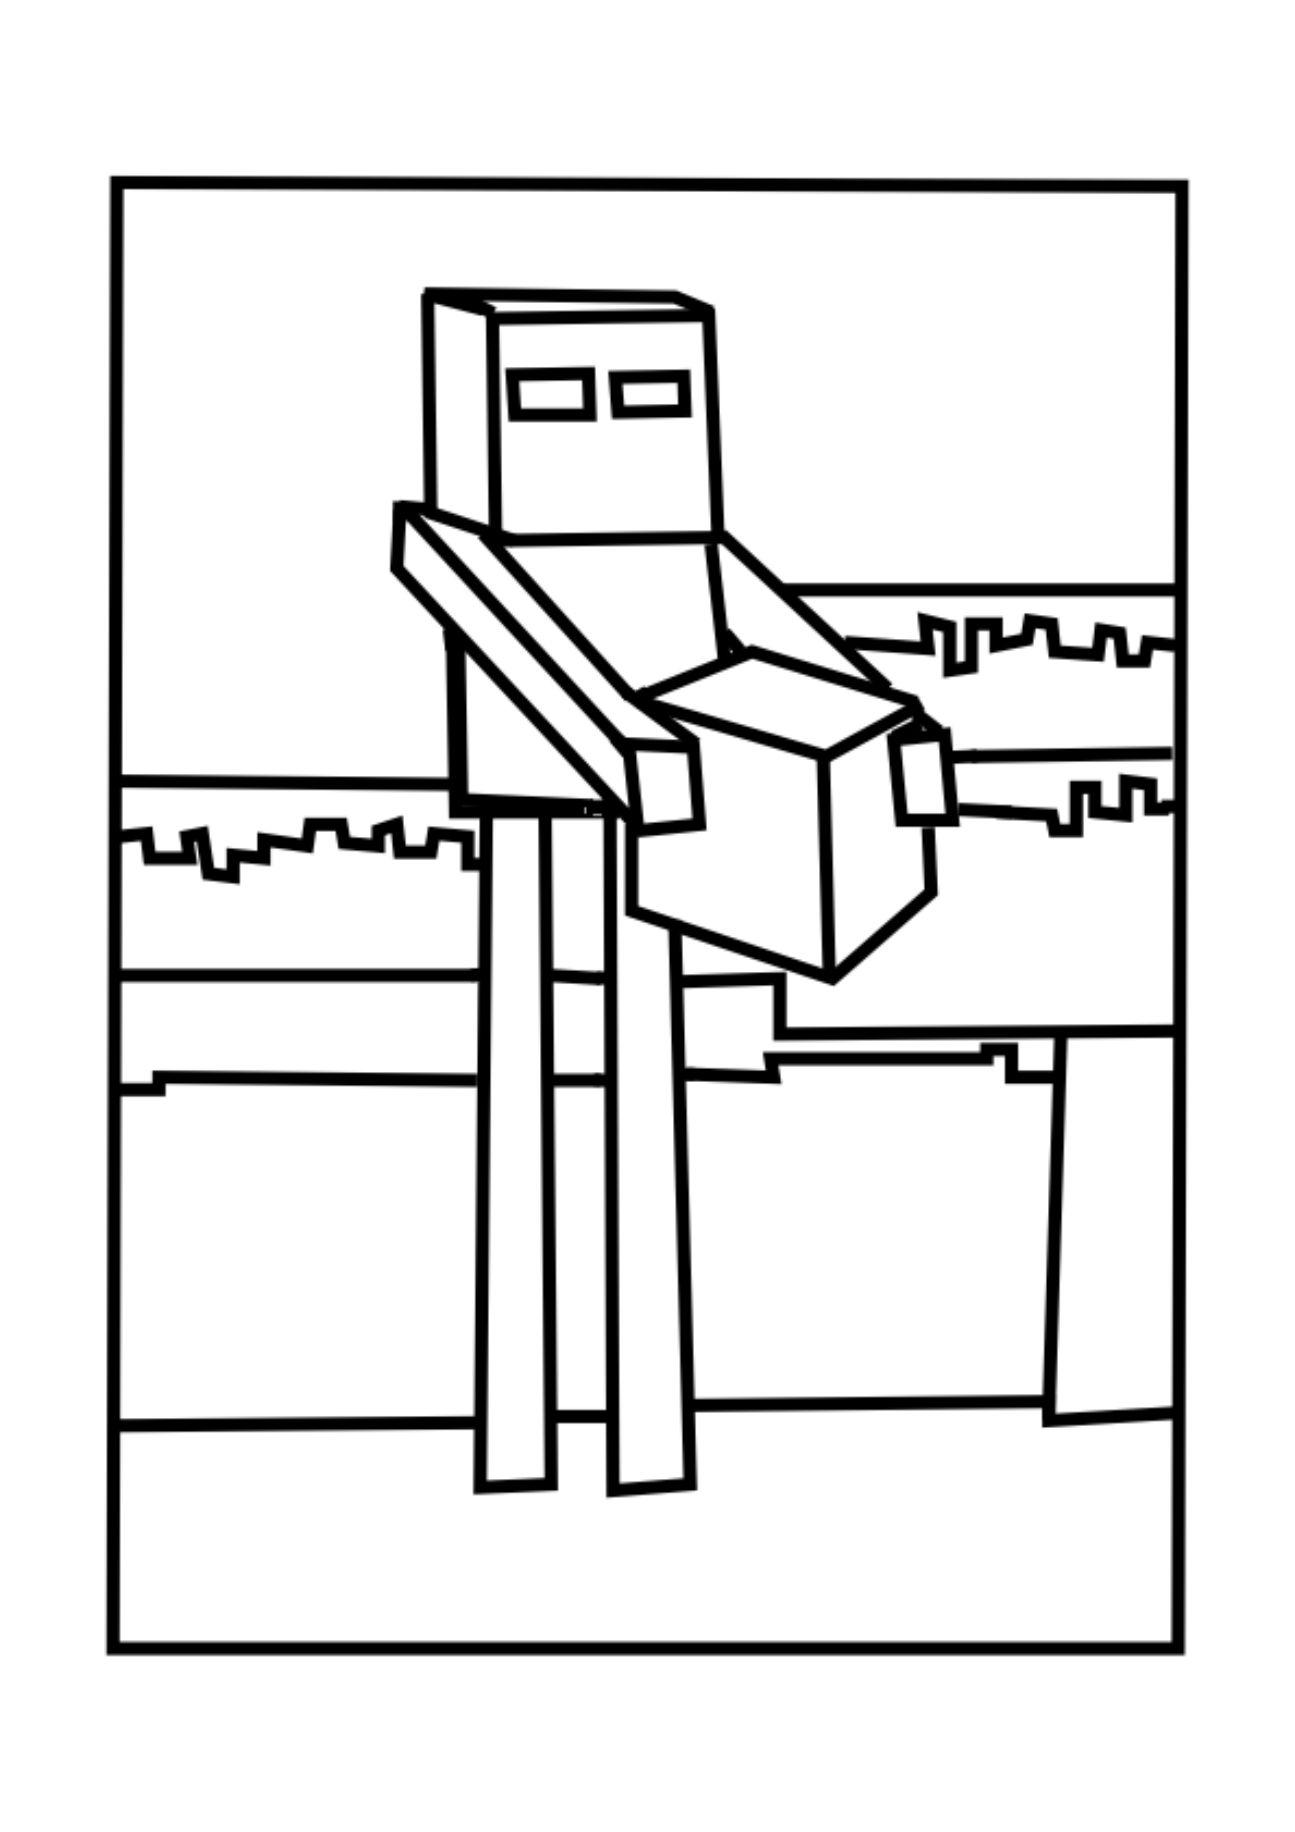 Enderman 2 Jpg 1 295 1 832 Pixels Colorir Figuras Treino Em Casa